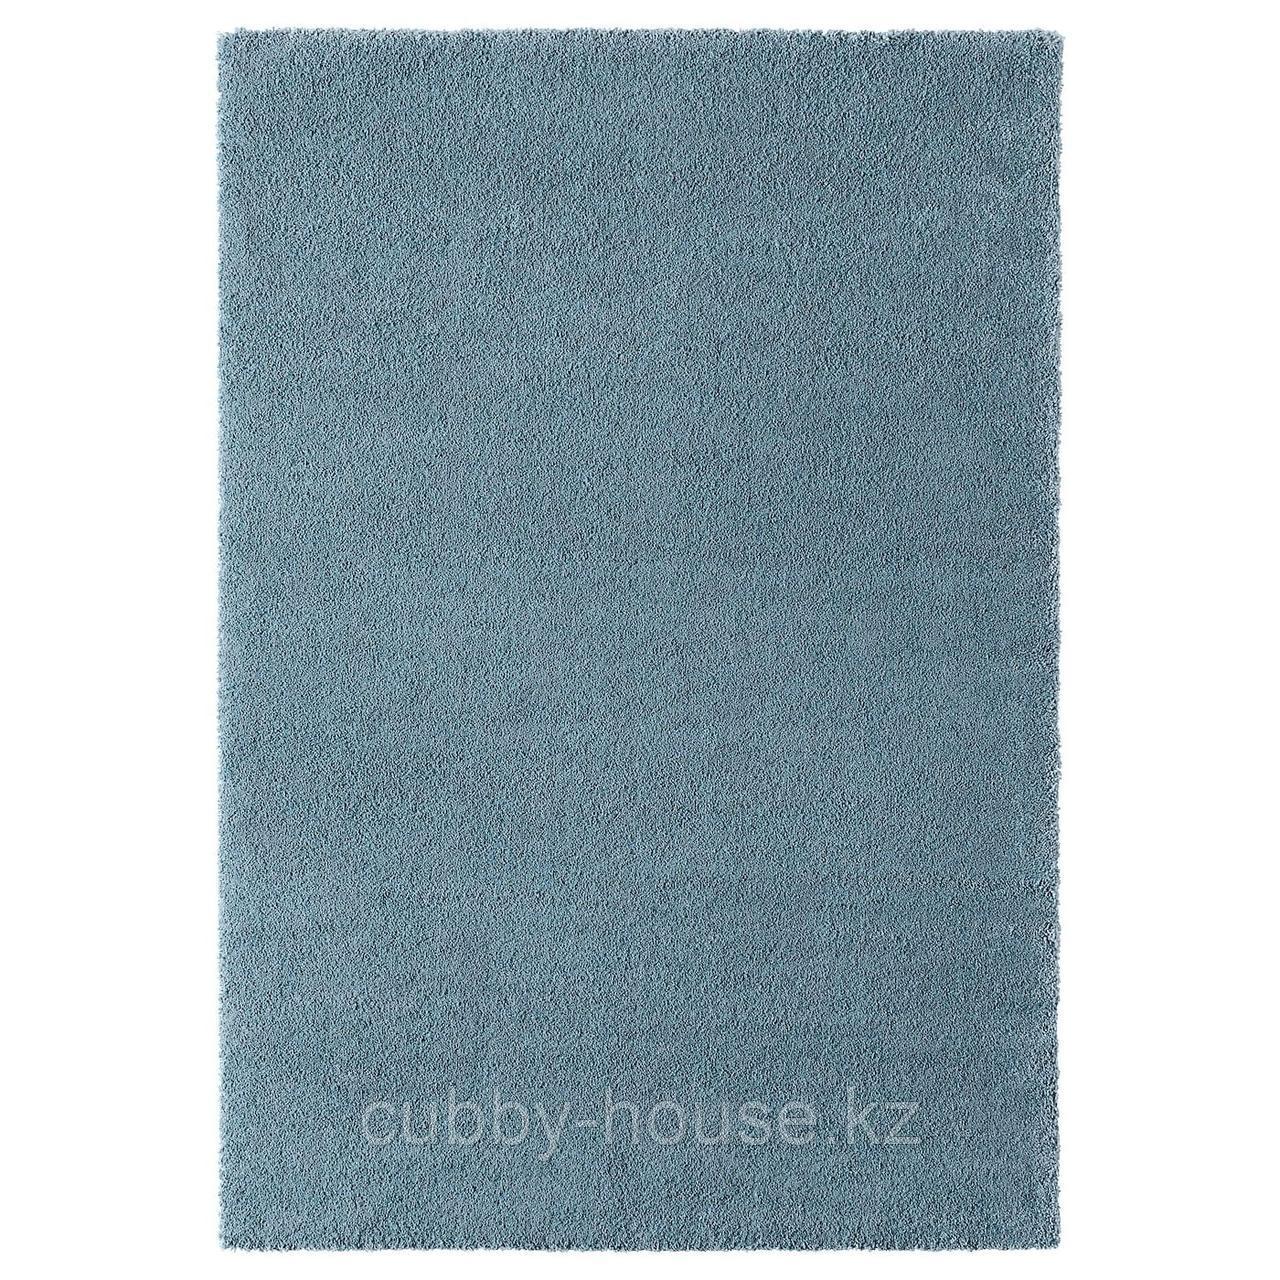 СТОЭНСЕ Ковер, короткий ворс, классический синий, 133x195 см